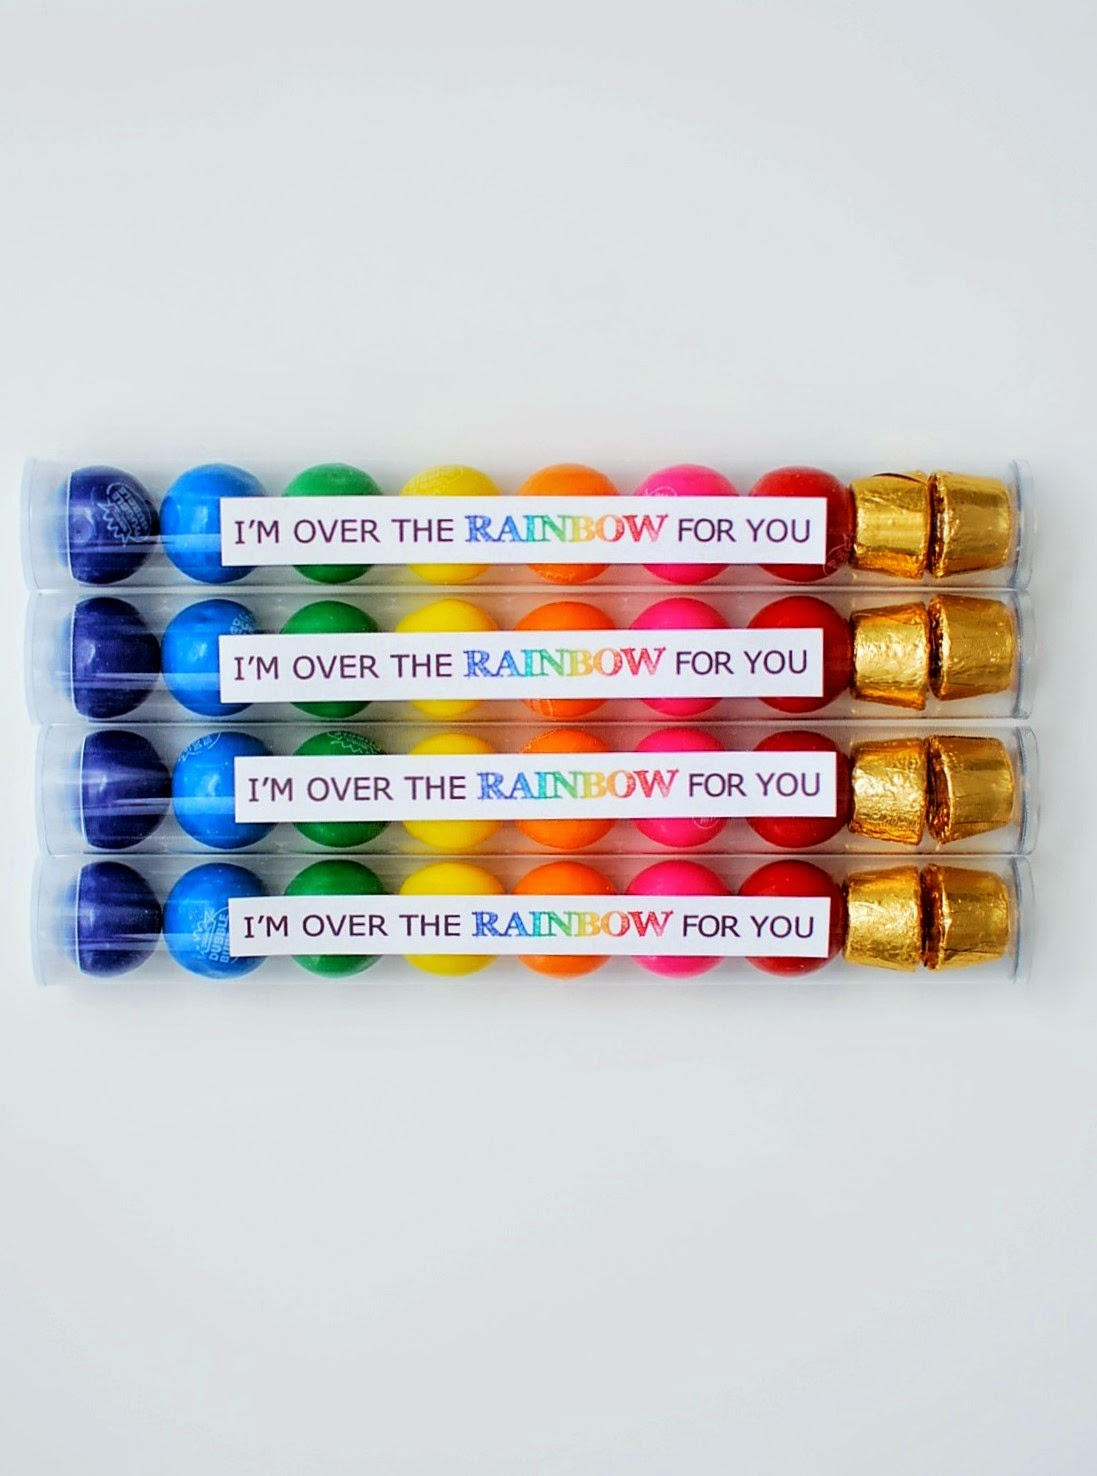 http://4.bp.blogspot.com/-WkLeLrPFbWs/VPiiiTouqCI/AAAAAAAAN8A/ltvV6Gm2nC8/s1600/rainbow-patrick-flag%2B(1).JPG